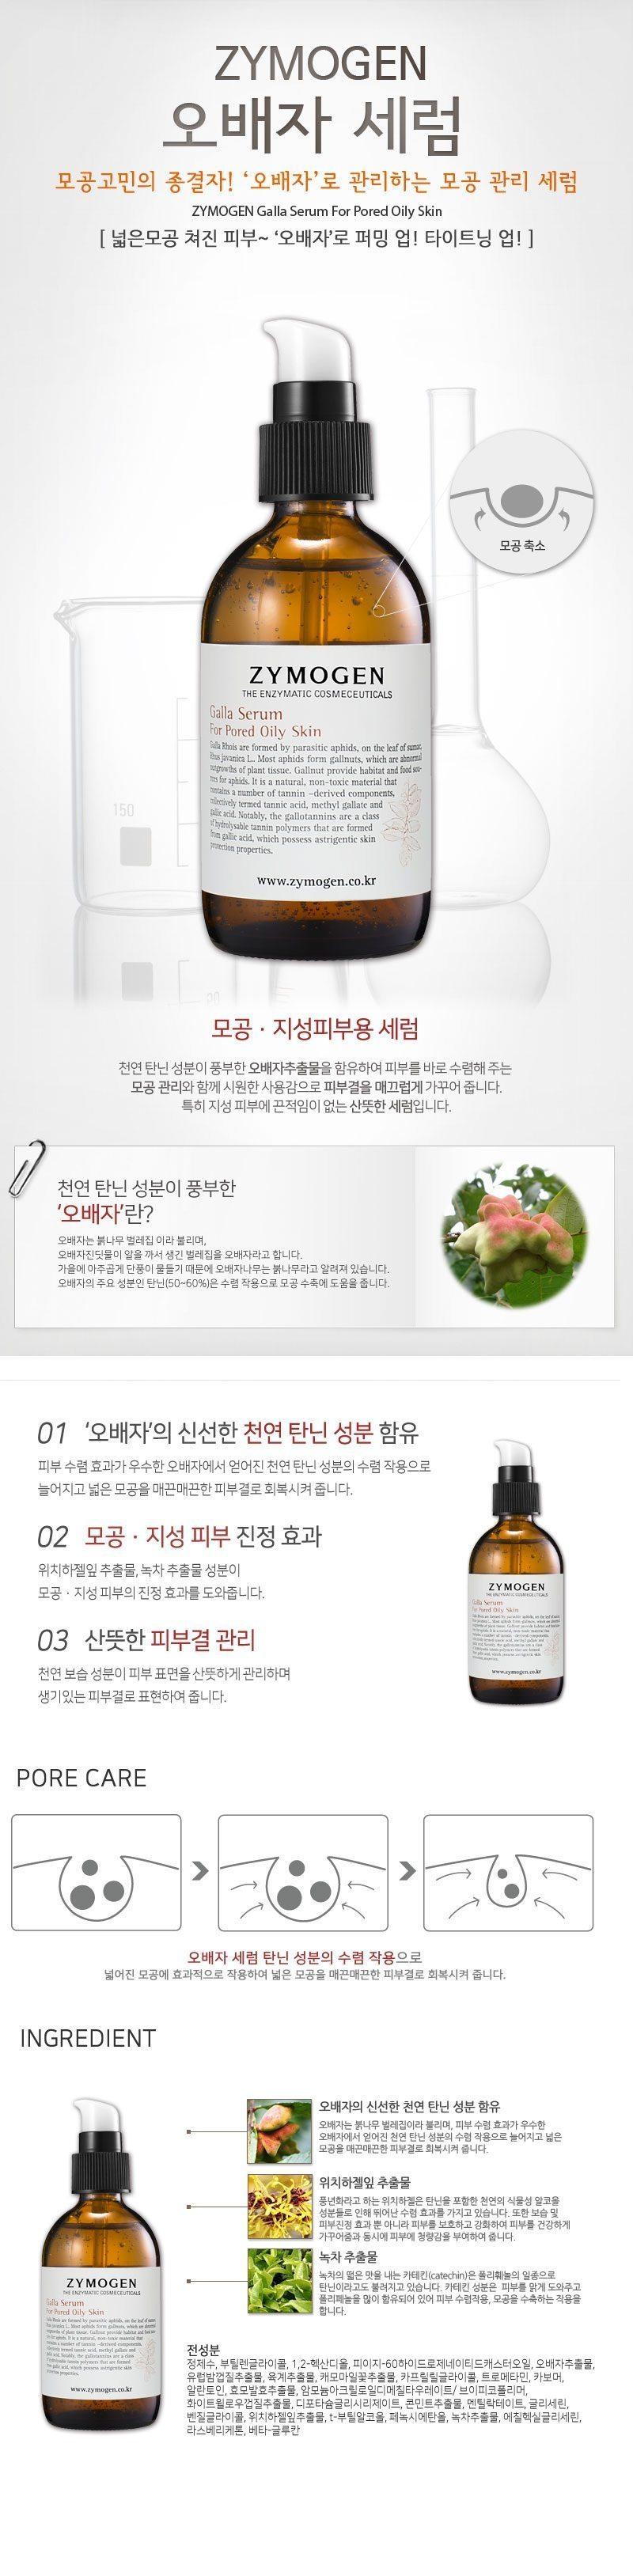 Zymogen Galla Serum For Pored Oily Skin korean cosmetic skincar product online shop malaysia brazil macau1